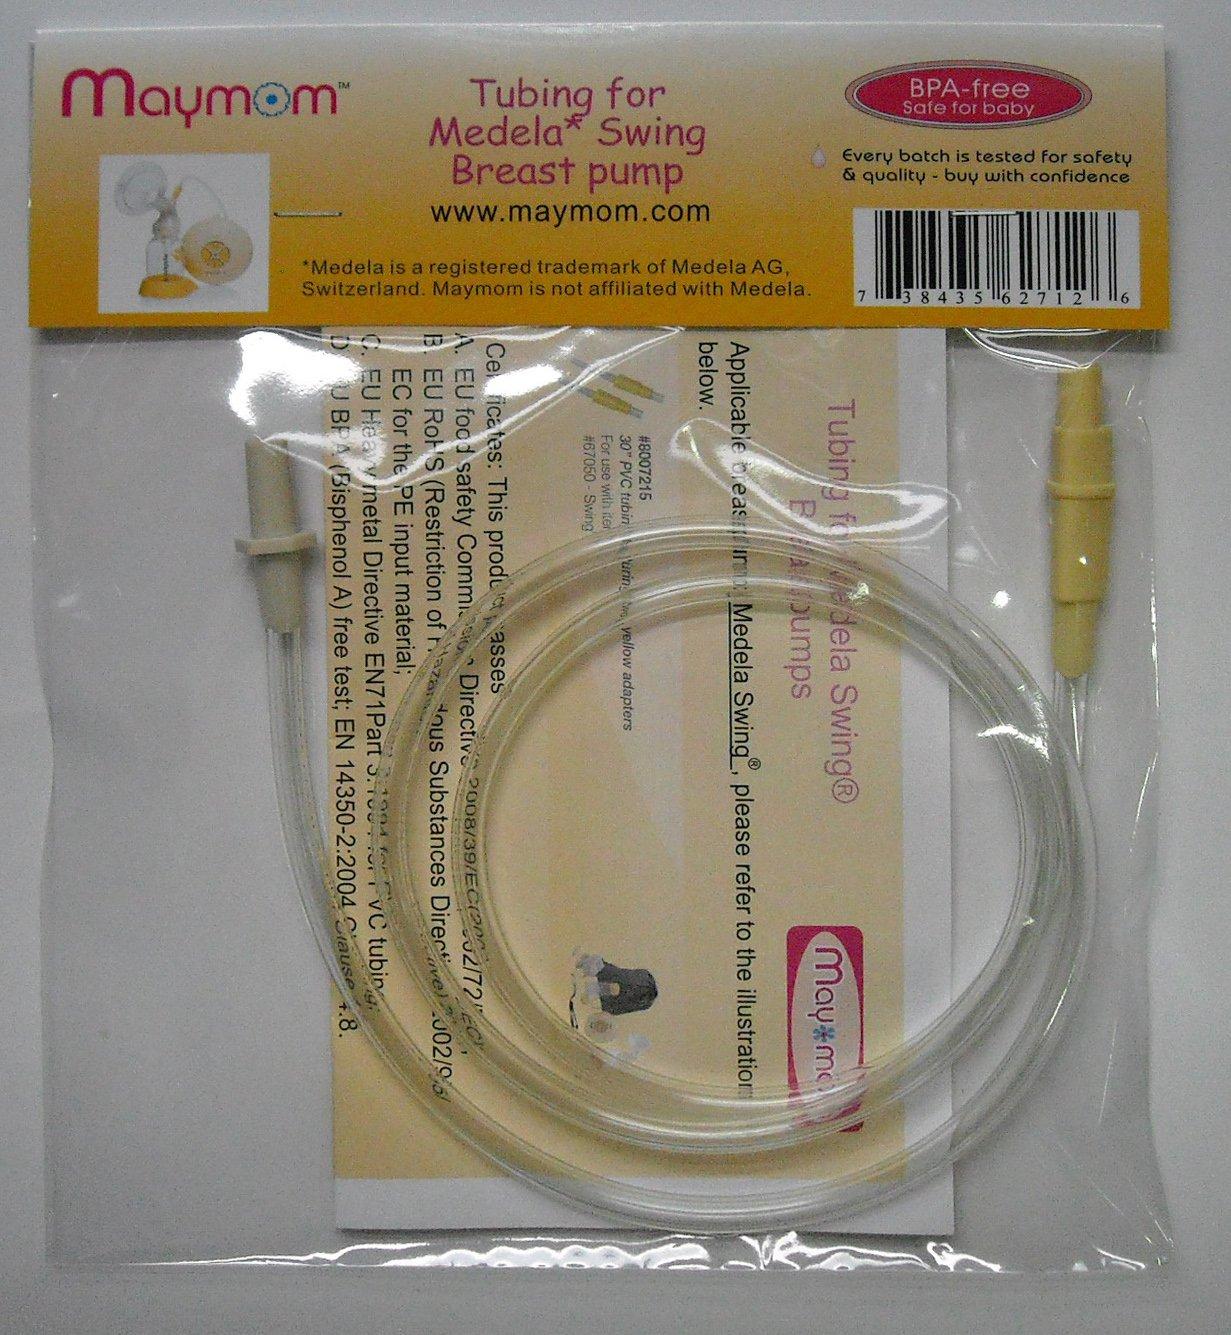 Tubing for Medela Swing Breastpump (1-Pack)